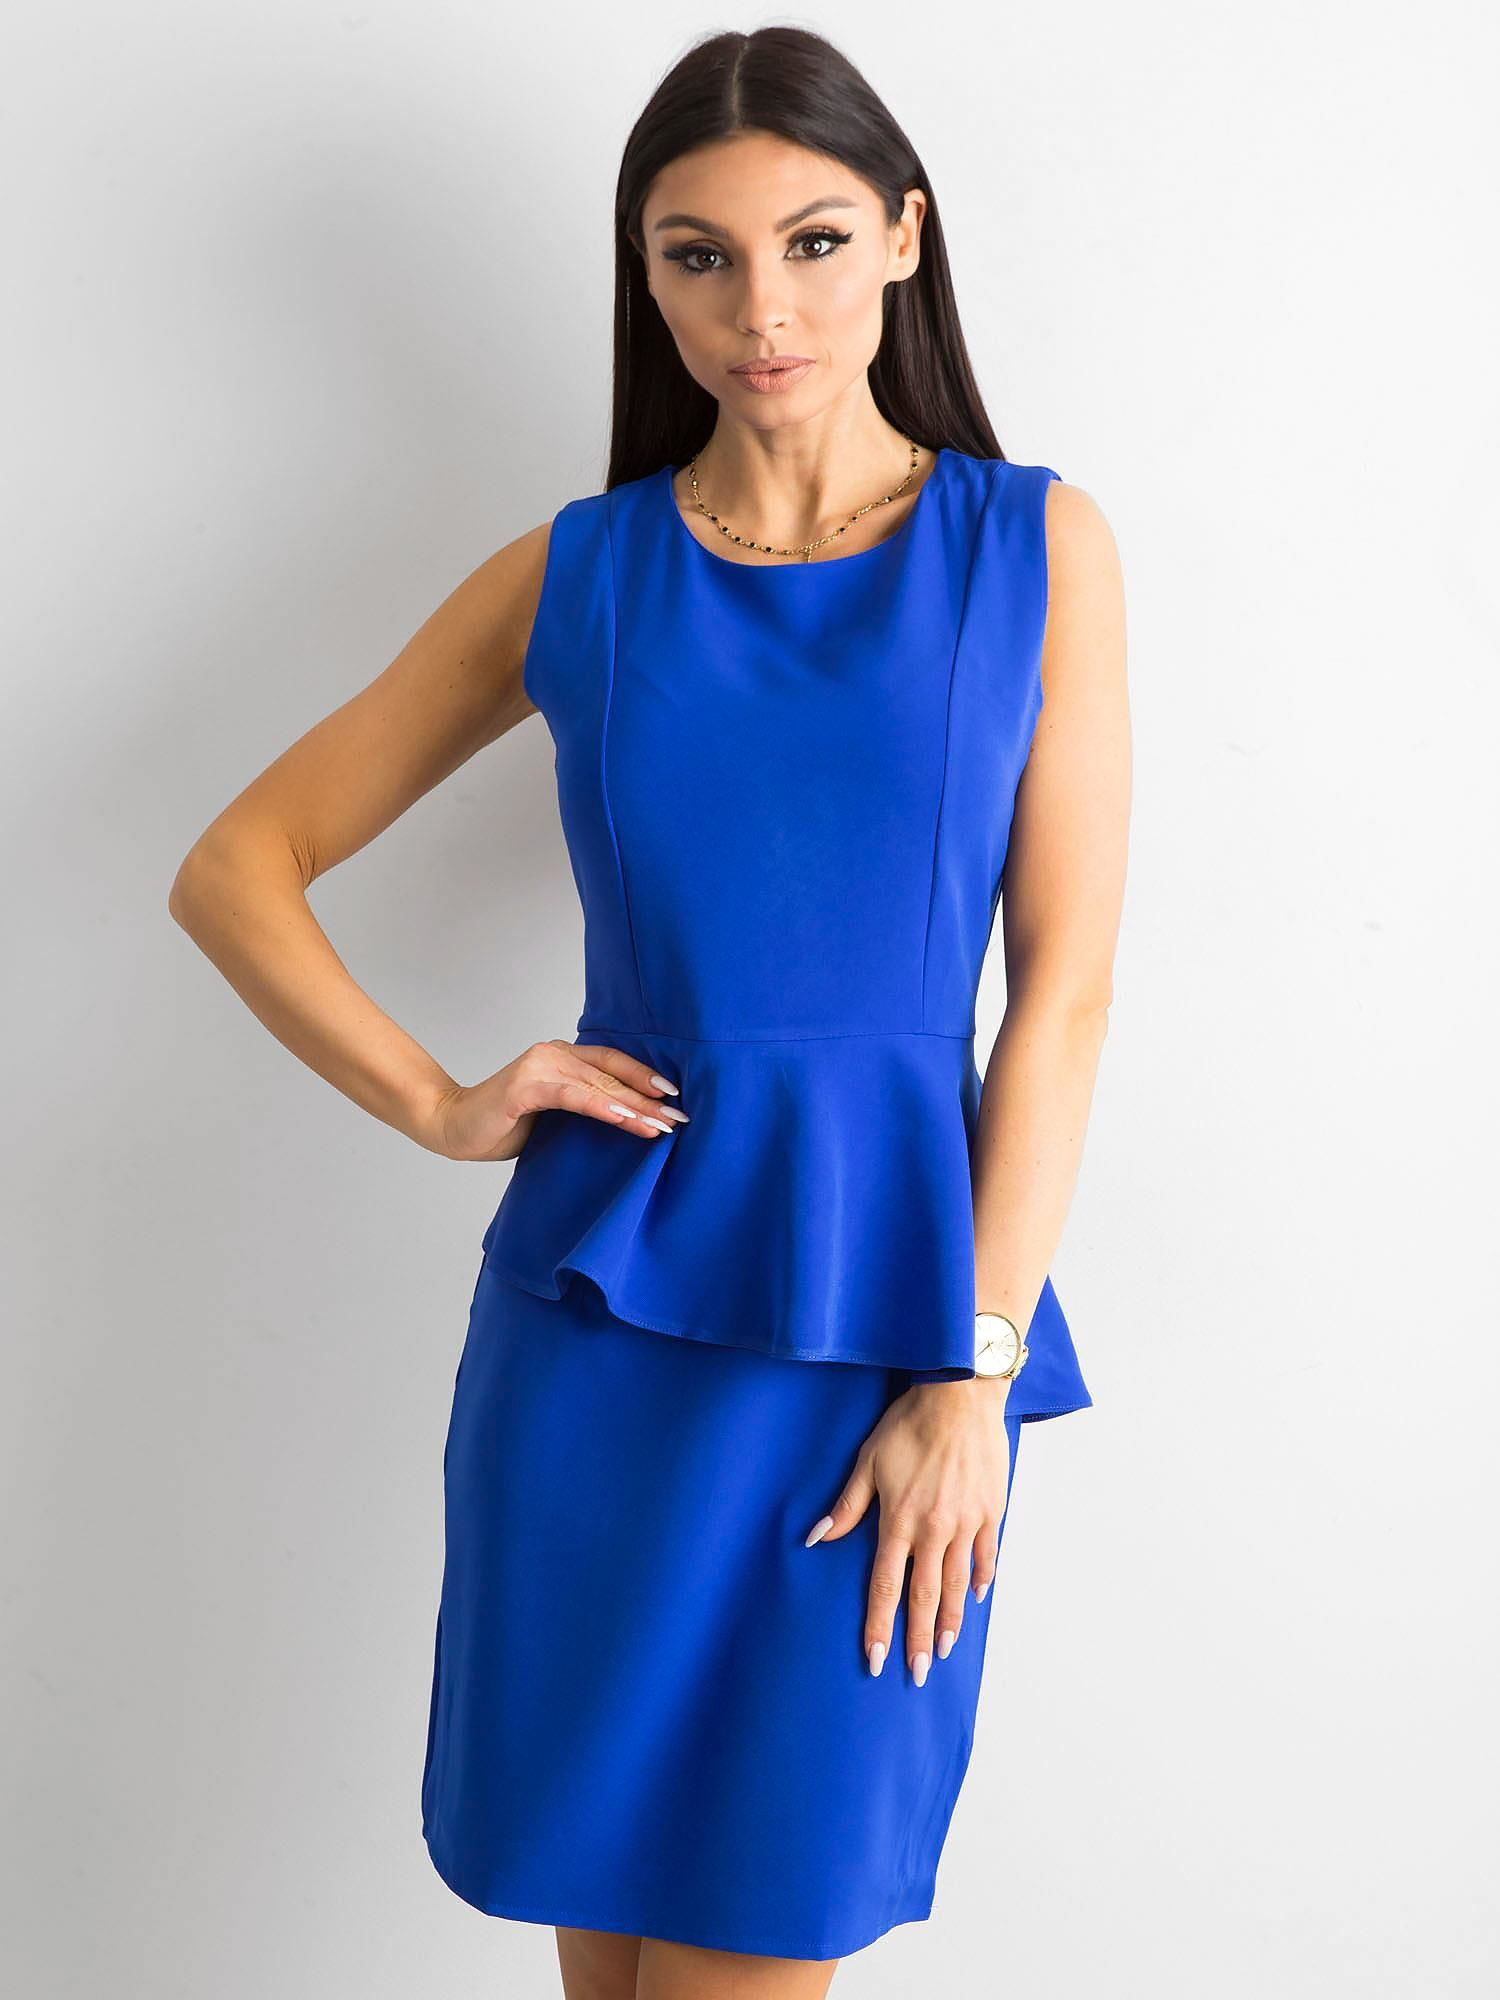 1729e4cbe5a5 Kobaltowa sukienka z baskinką - Sukienka koktajlowa - sklep eButik.pl